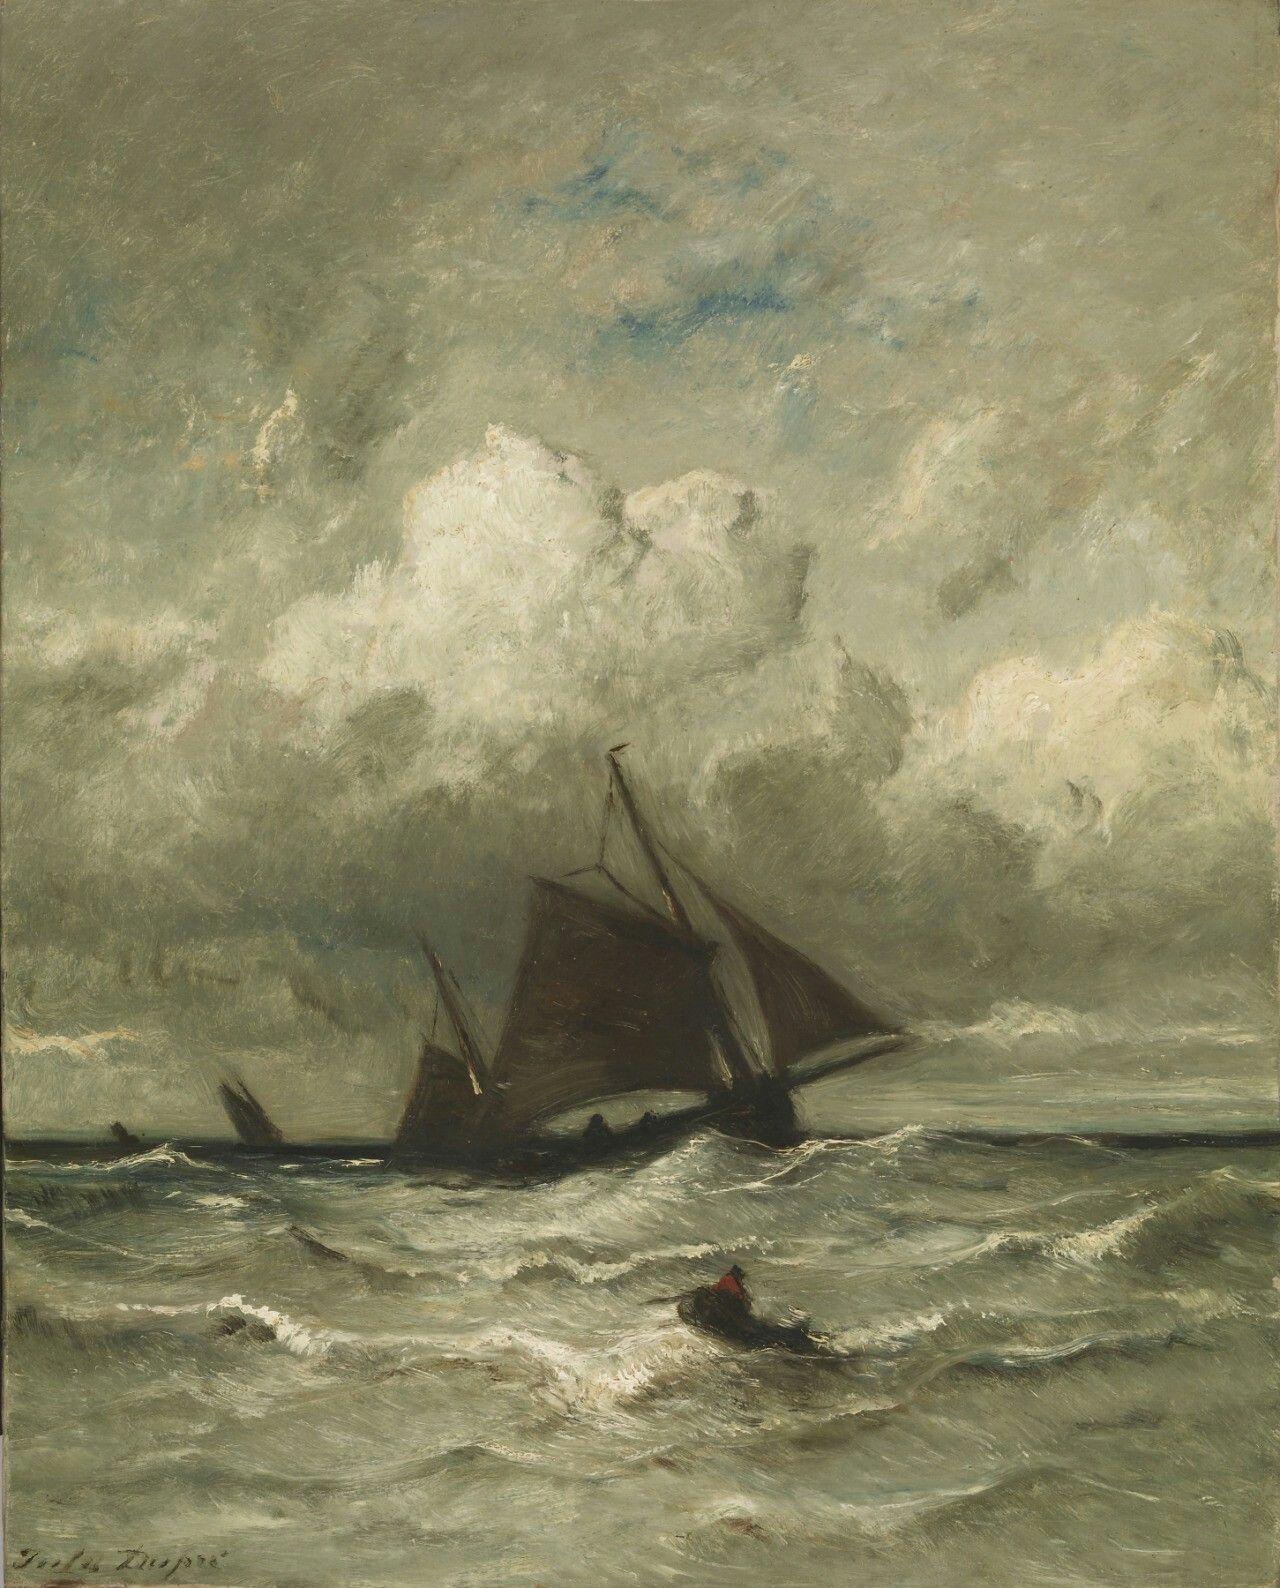 At Sea, 1870, Jules Dupré